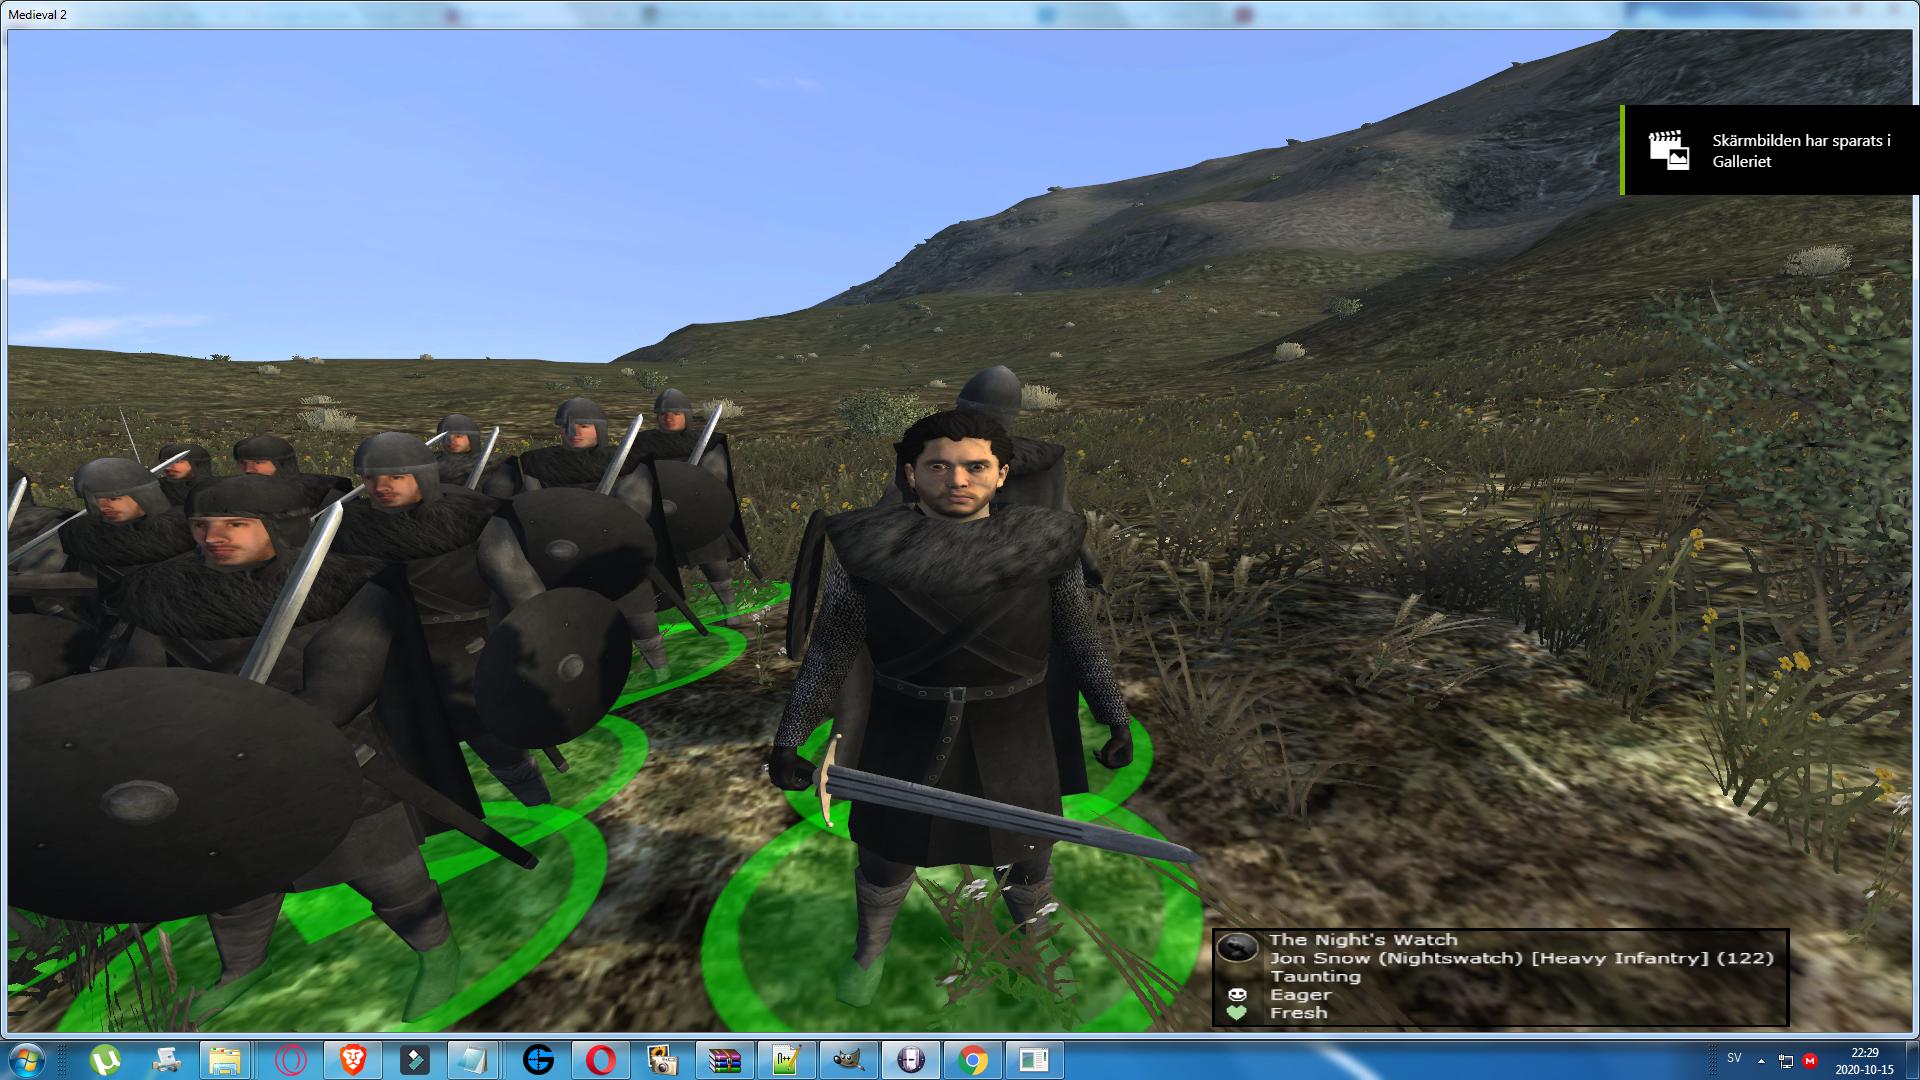 Jon Snow of the Nights Watch has been added as a custom hero!